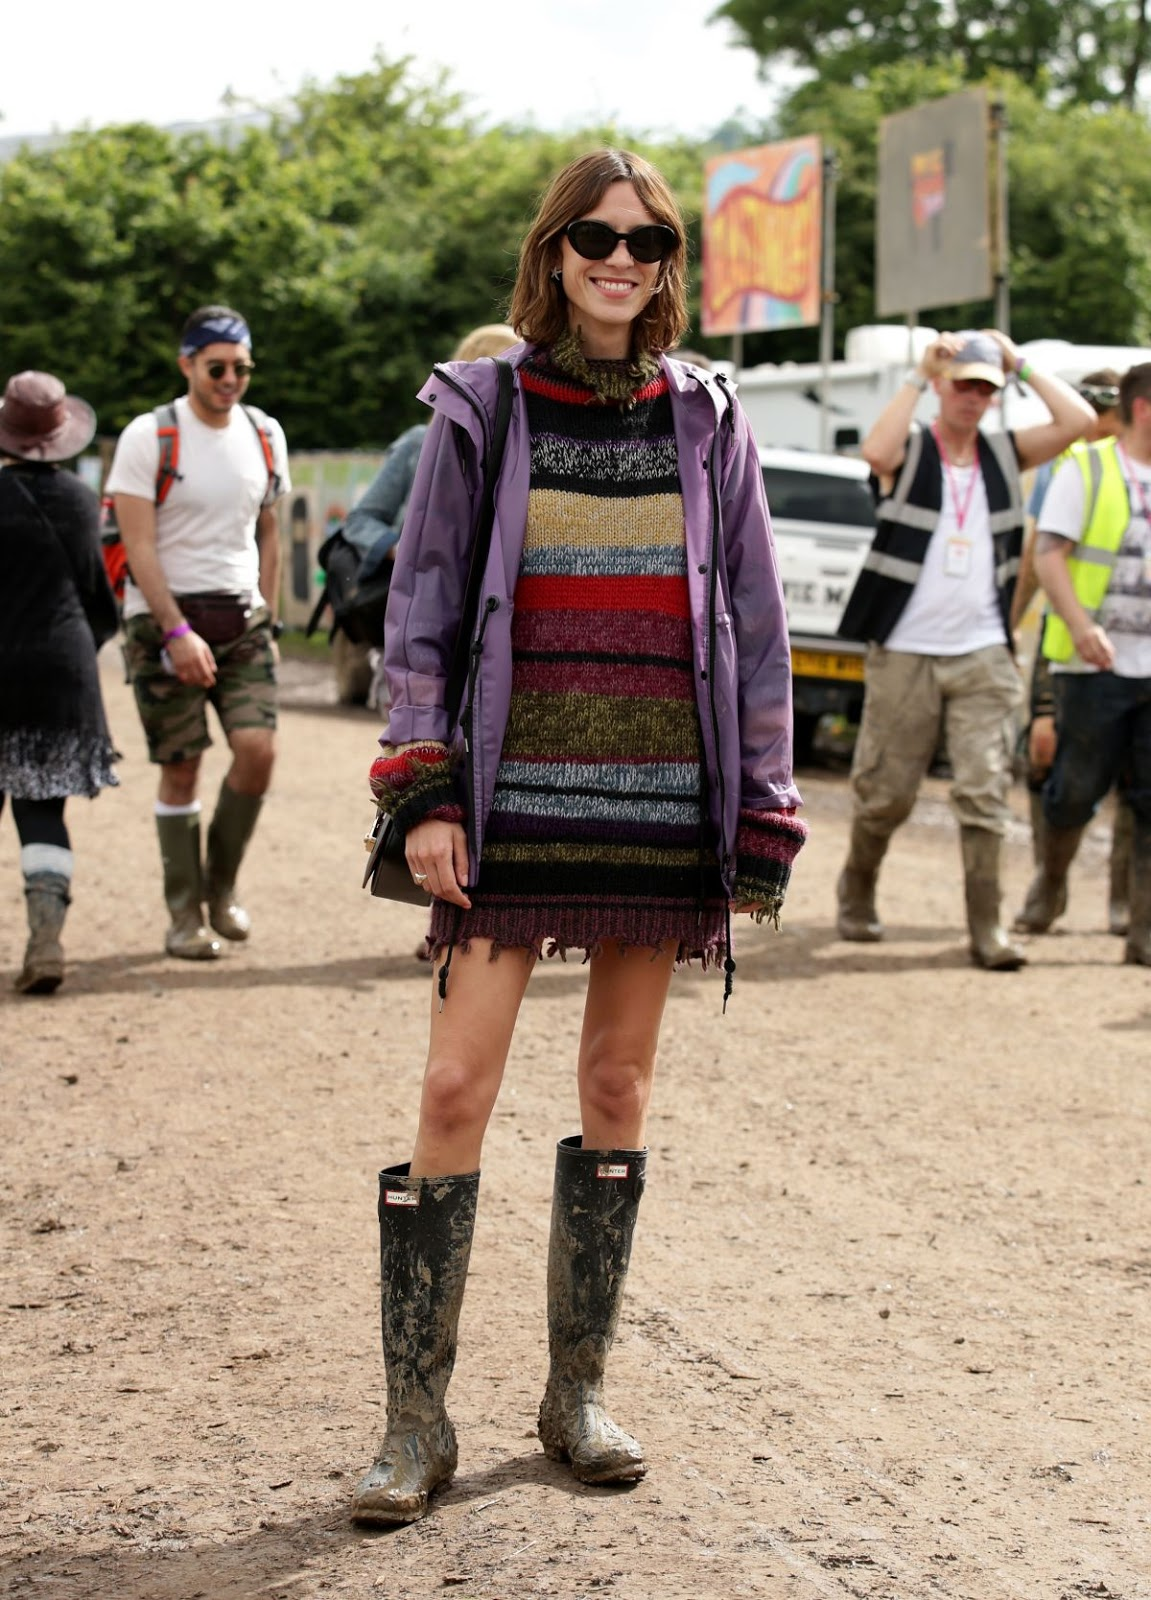 HQ Photos of Alexa Chung at 2016 Glastonbury Festival at Worthy Farm in Glastonbury